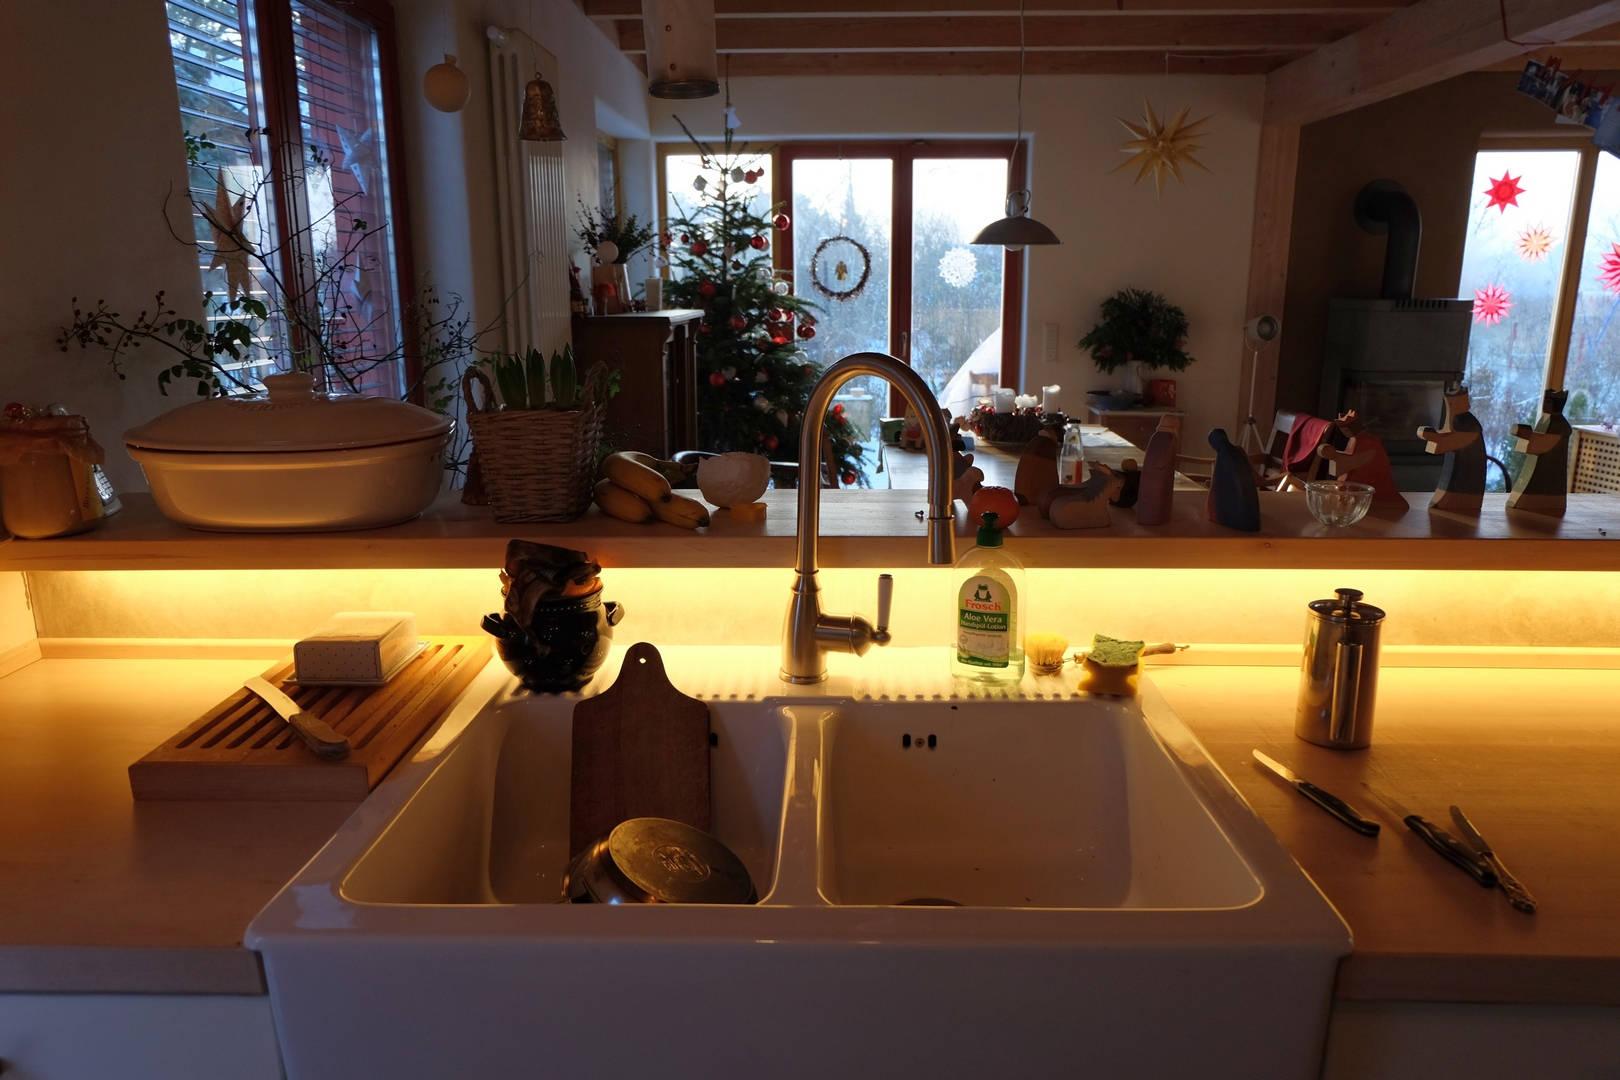 indirekte beleuchtung an wand decke selber bauen. Black Bedroom Furniture Sets. Home Design Ideas